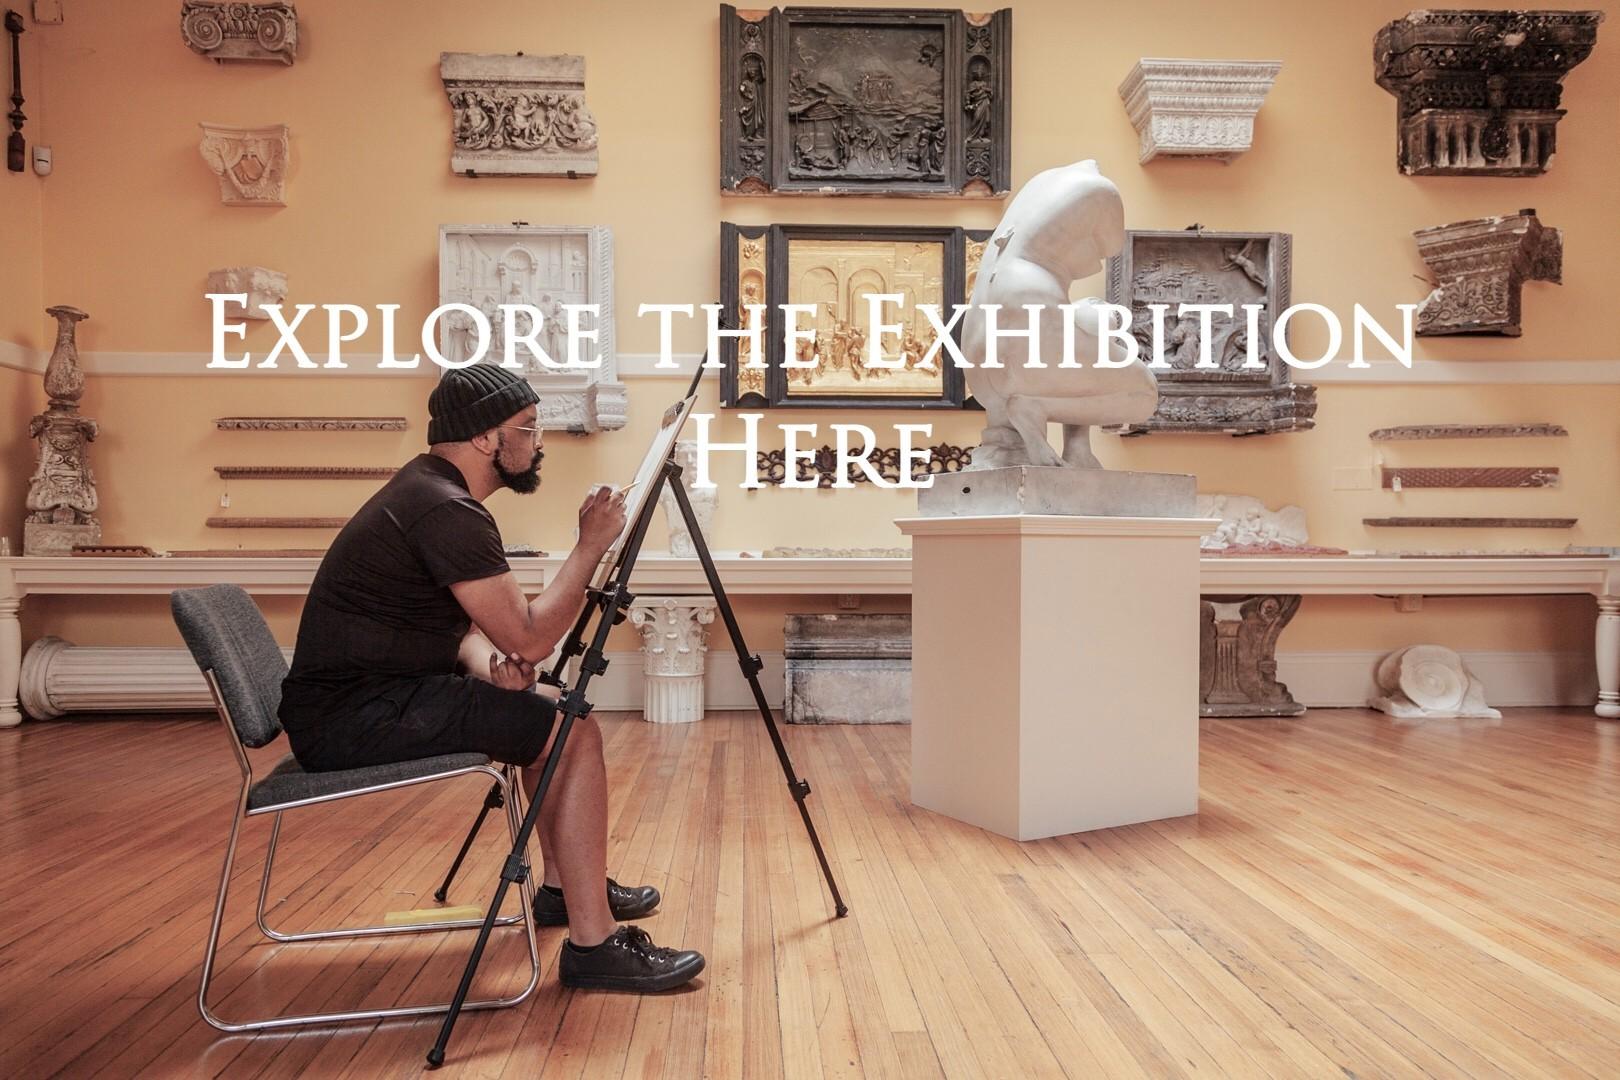 Explore the Exhibition here